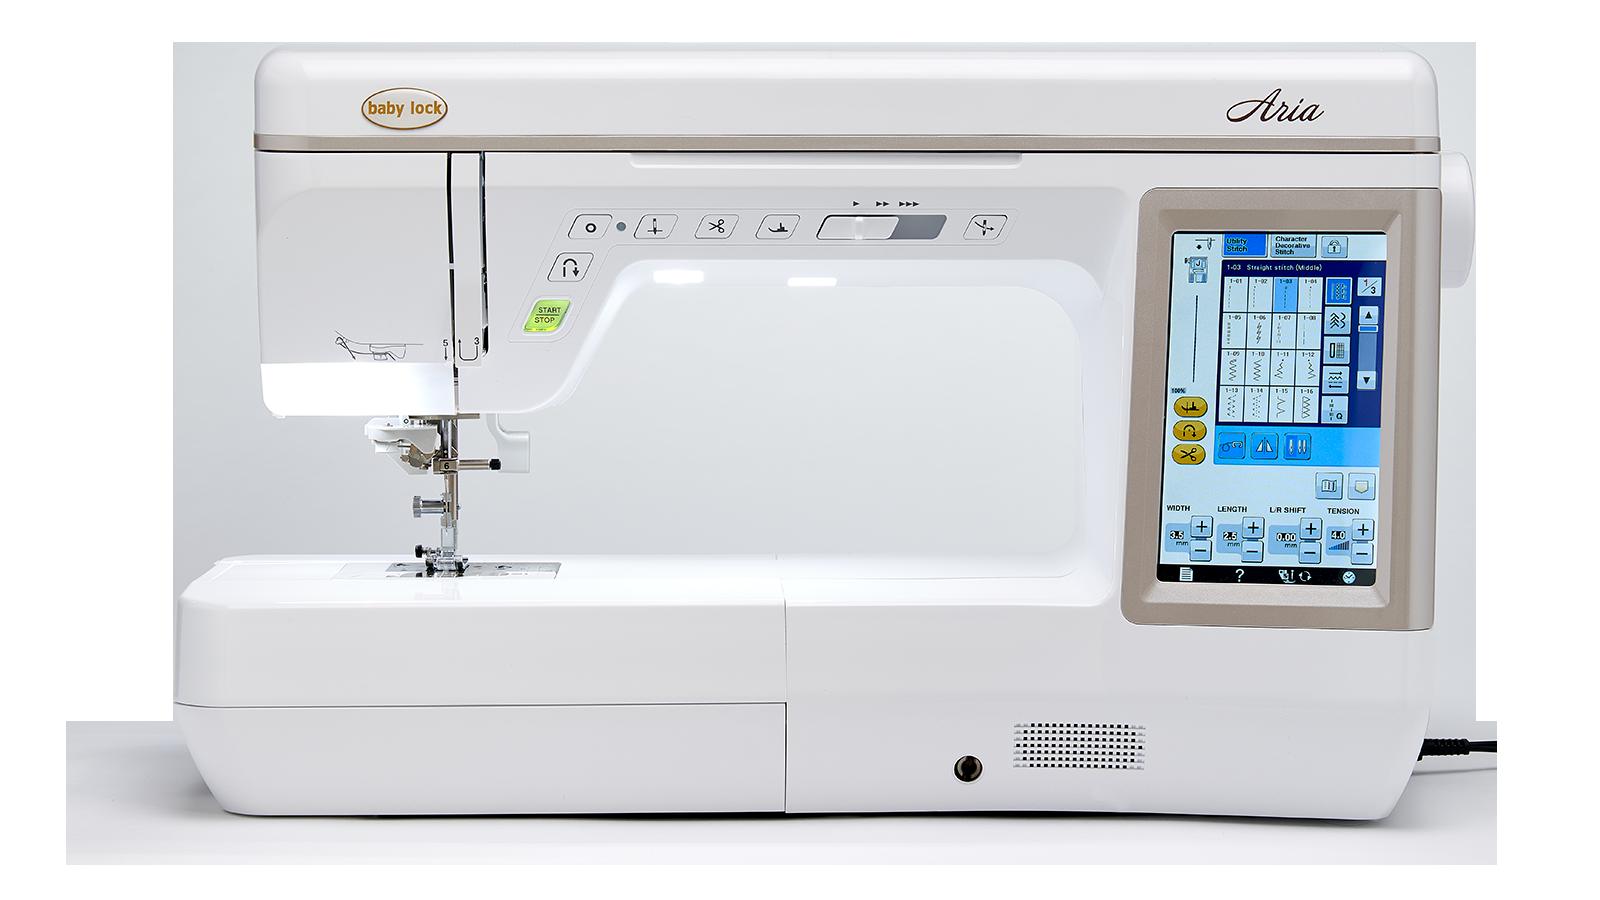 Baby Lock Aria - Quilting & Sewing Machine